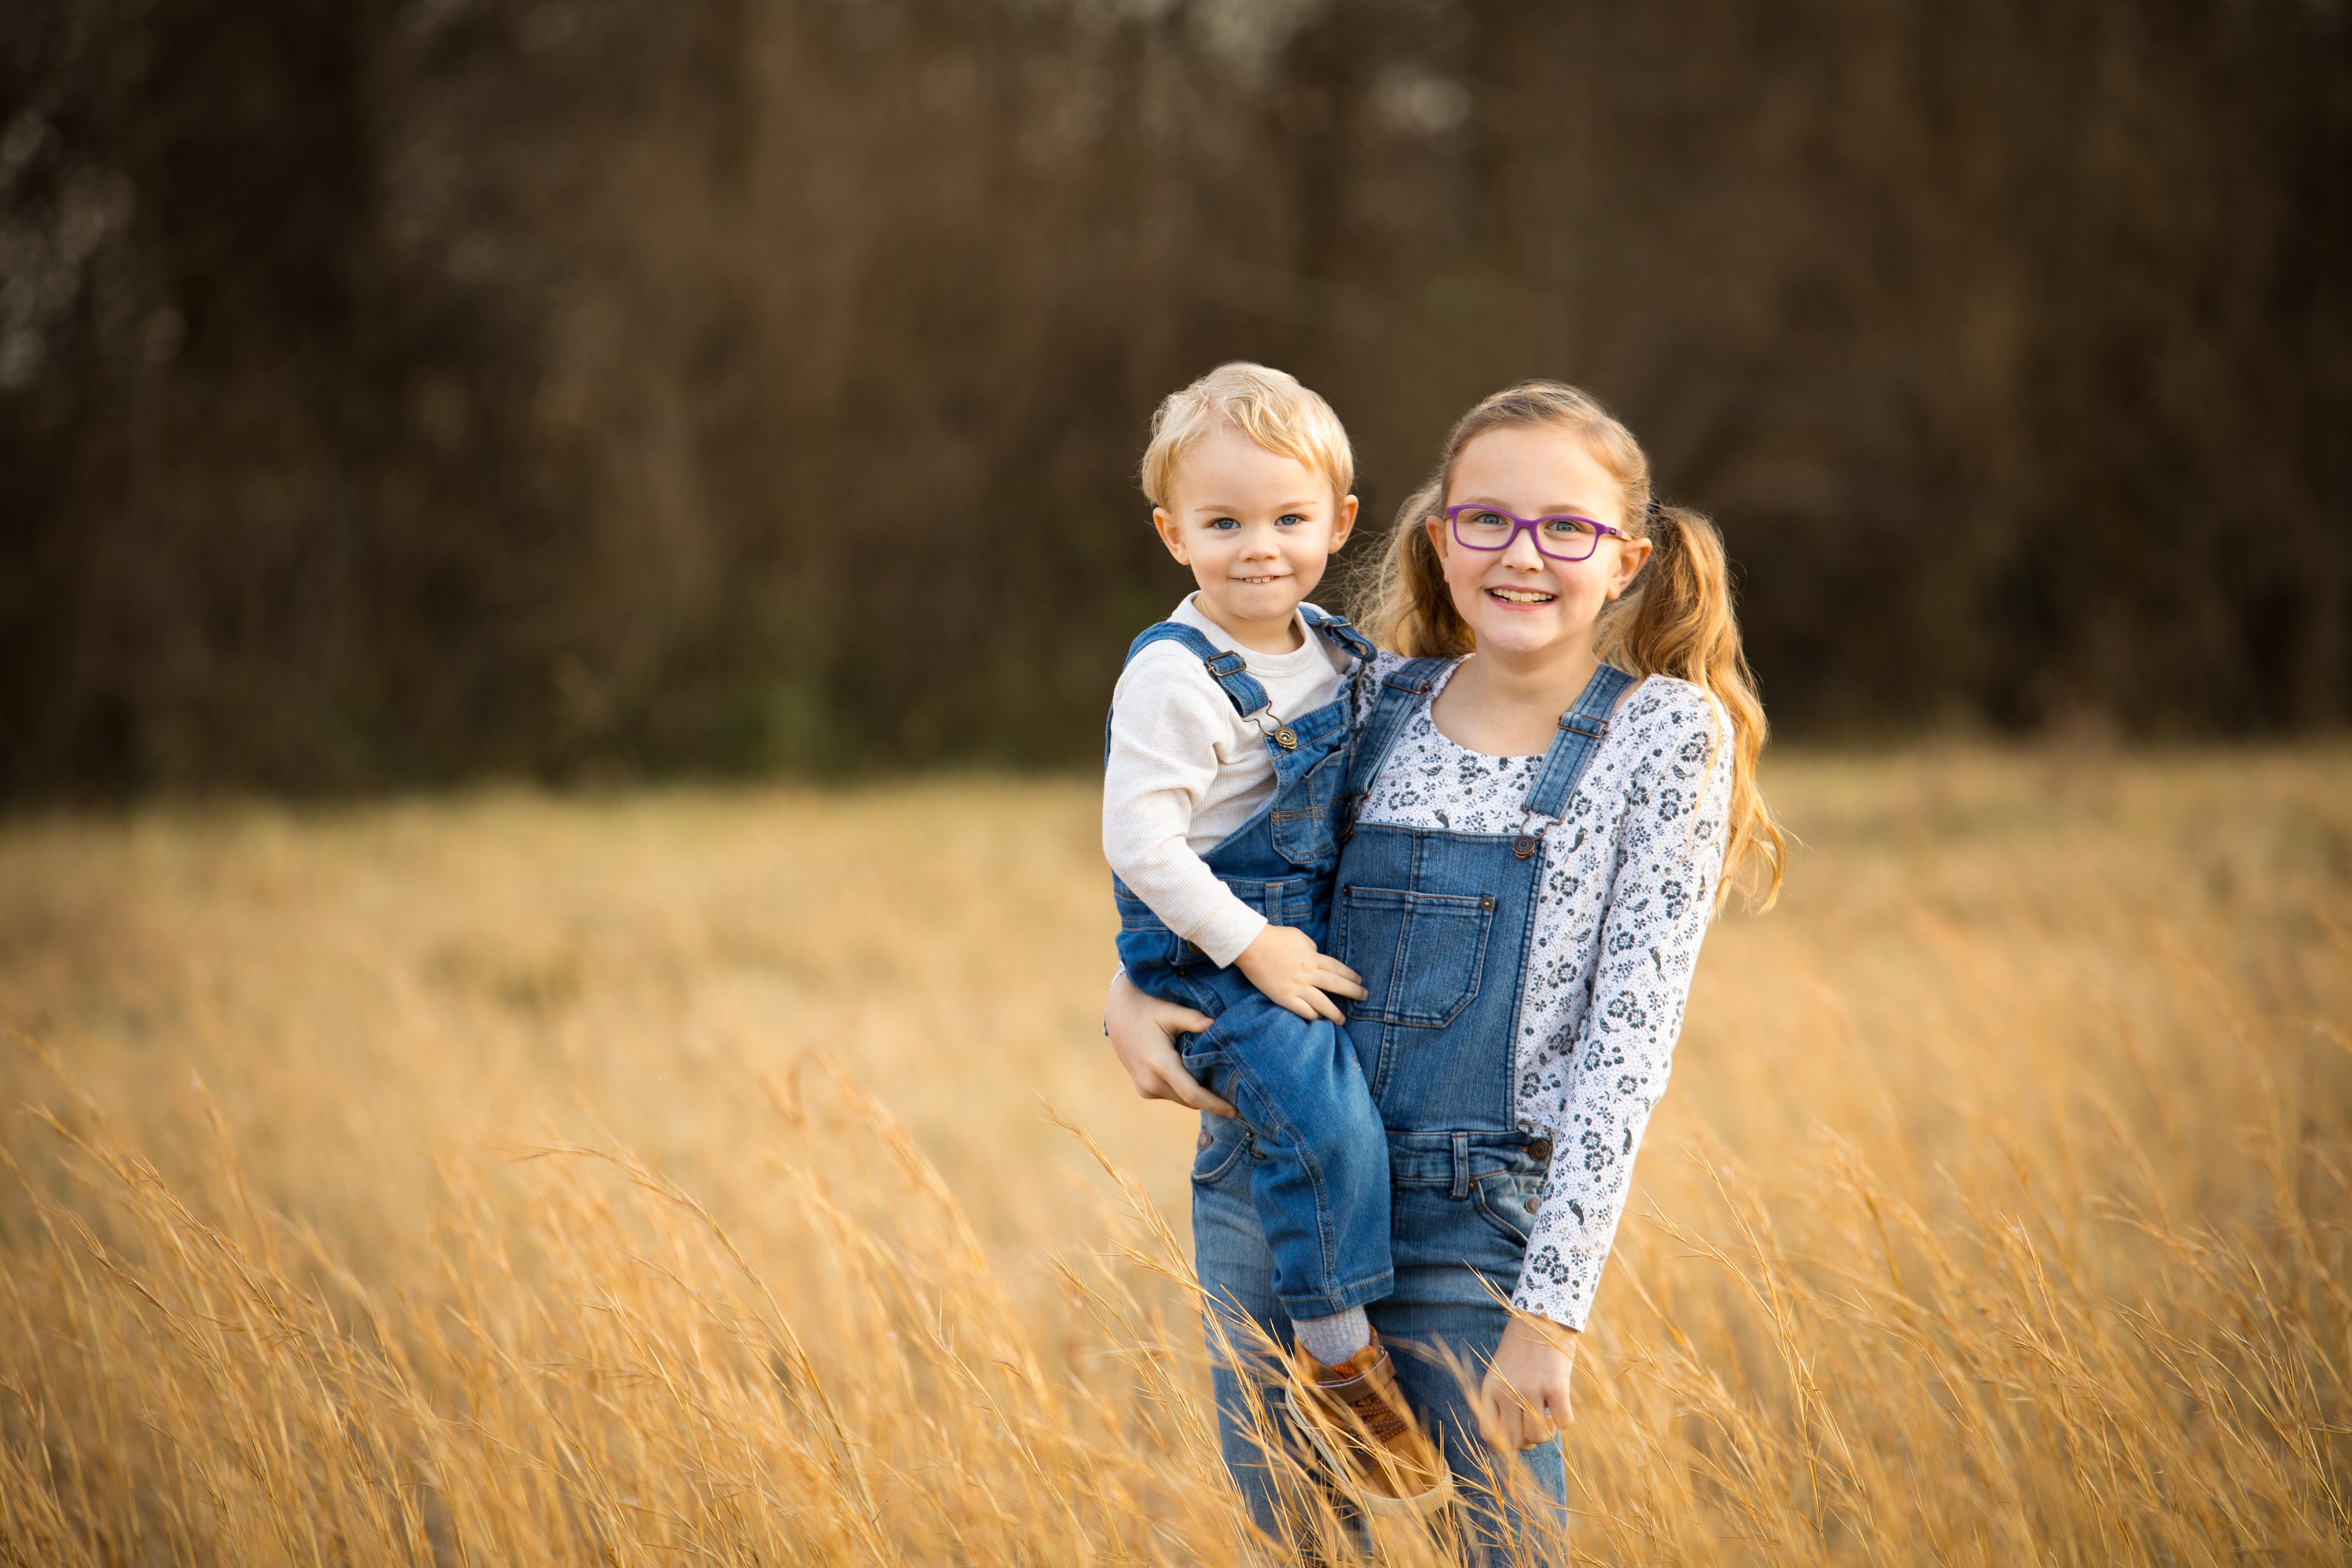 sibling photo in field